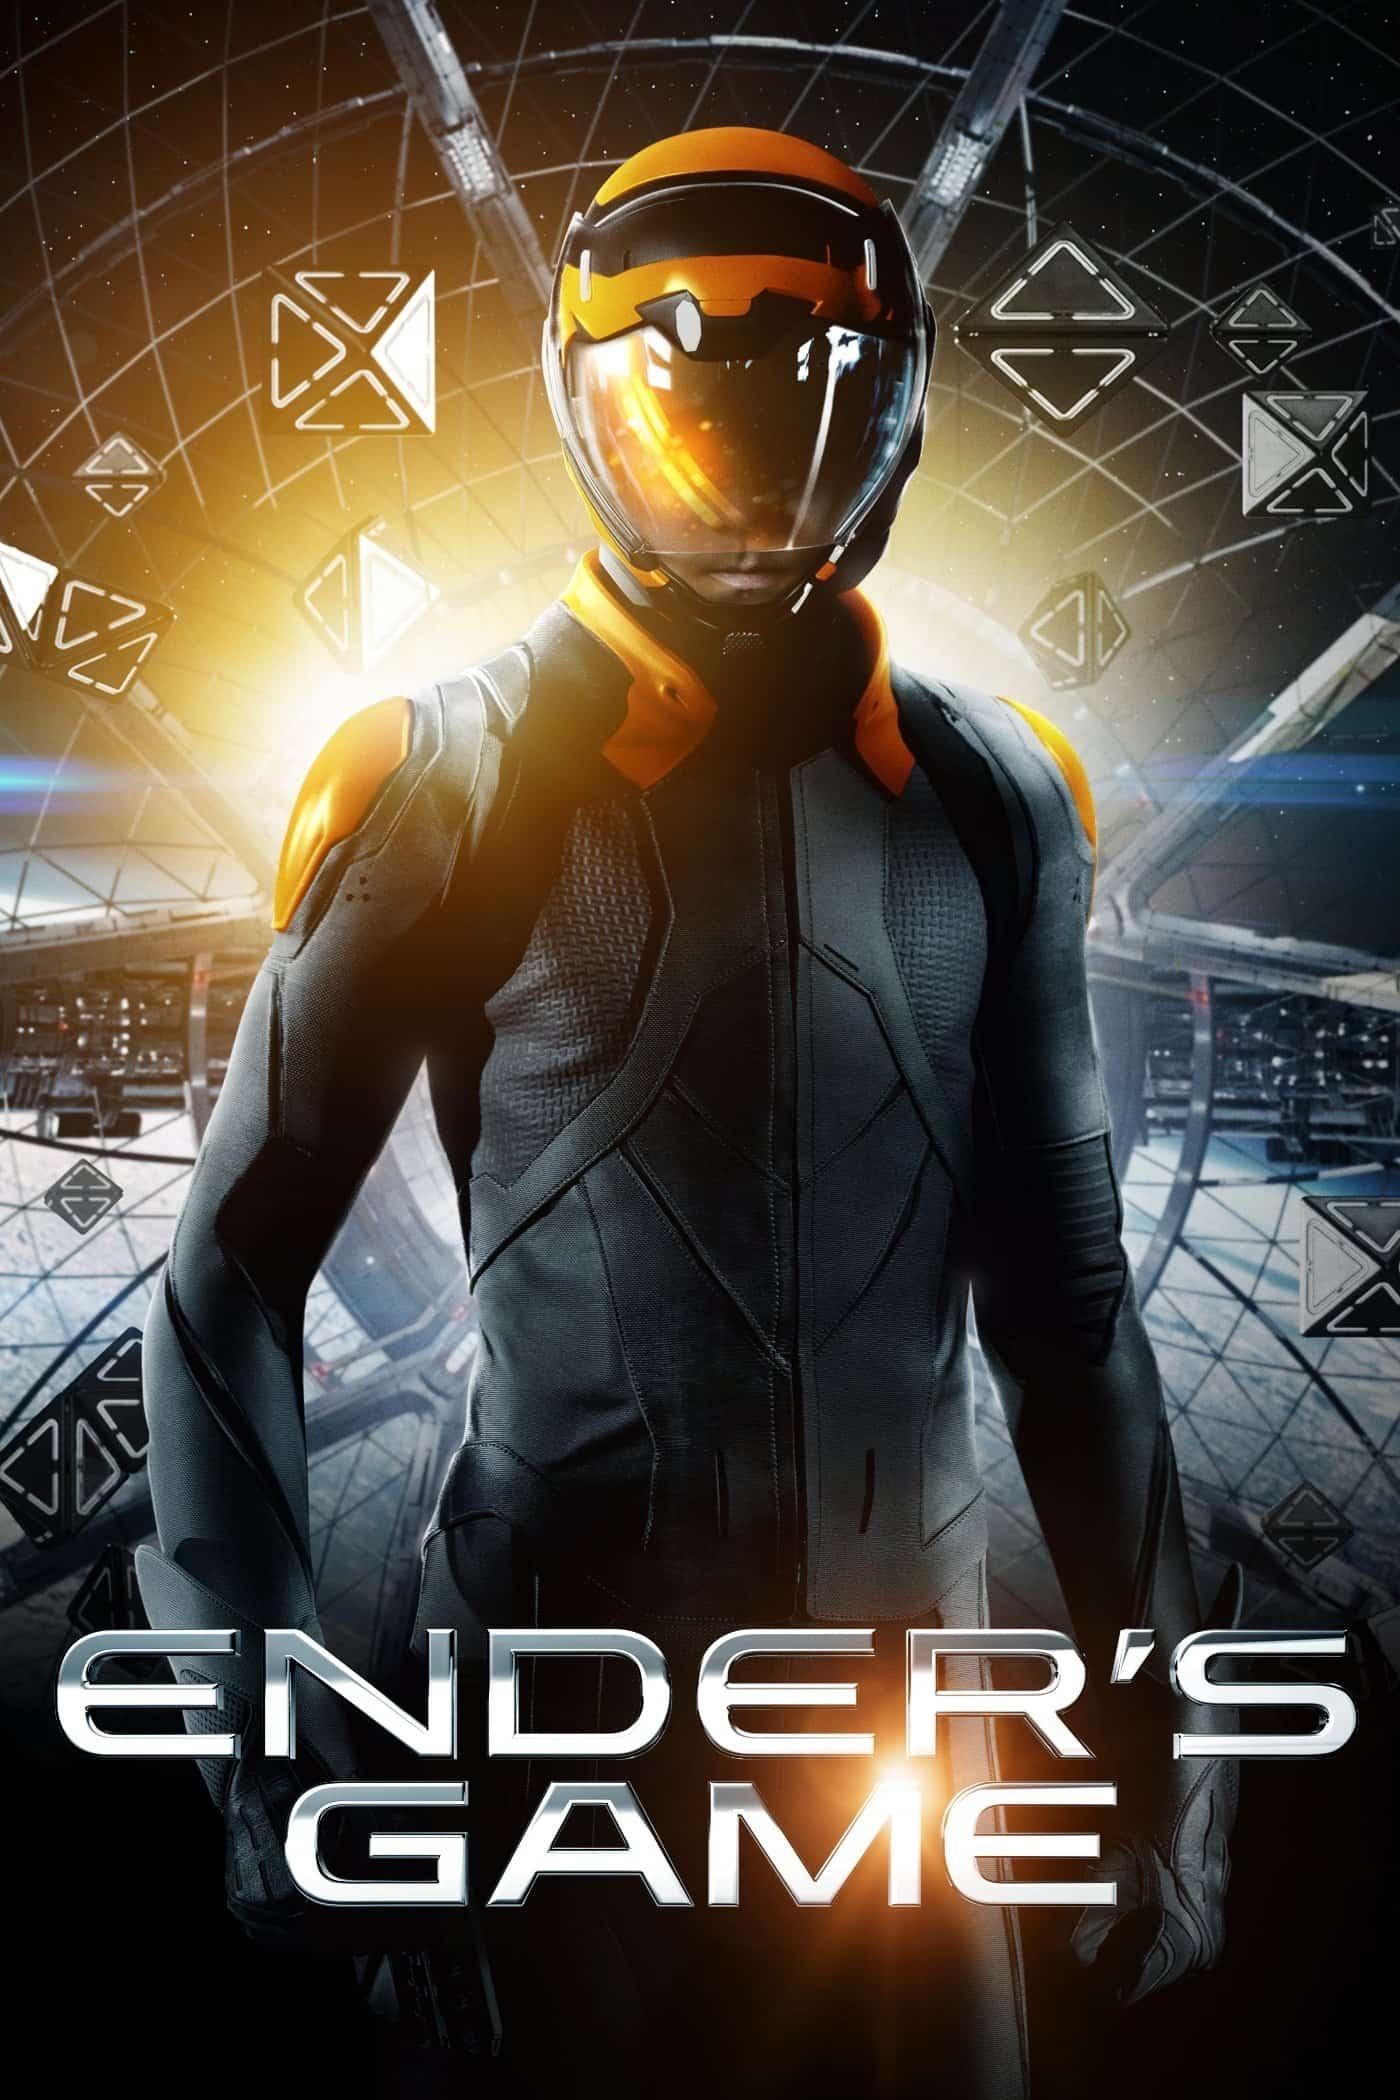 Ender's Game, 2013